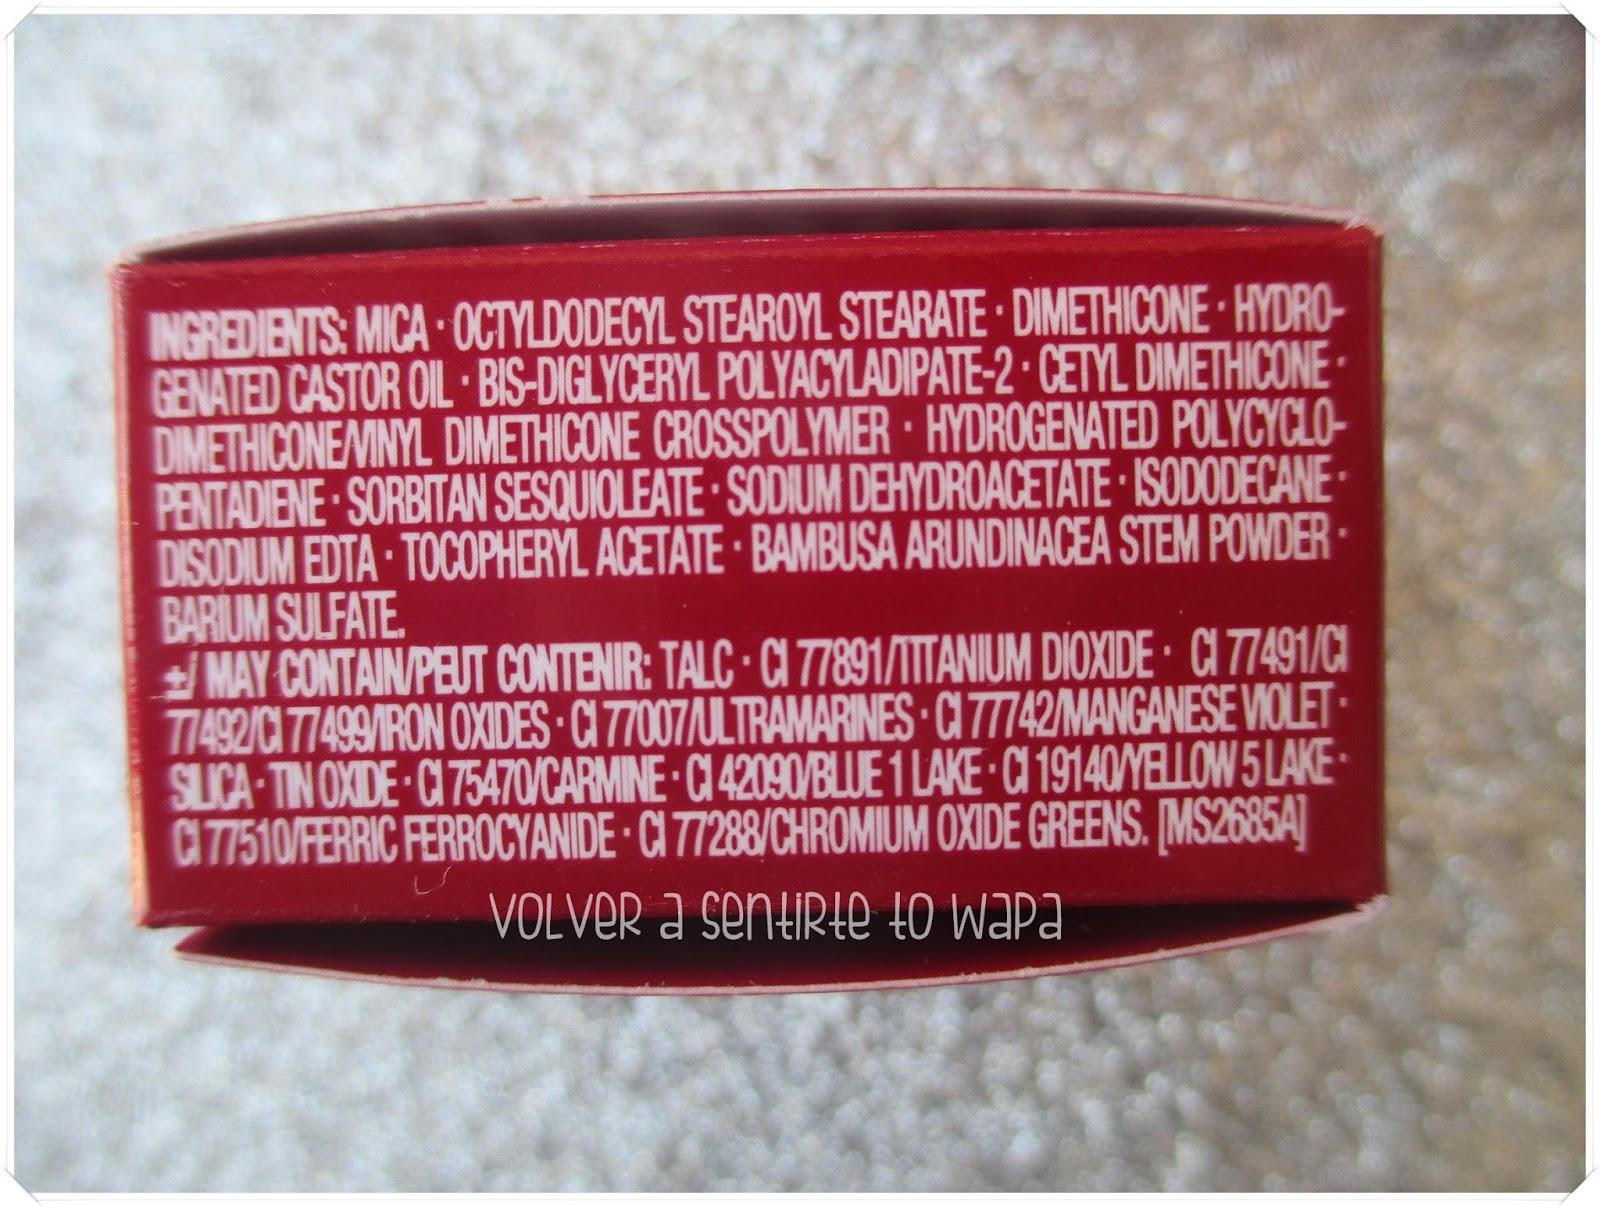 Ombre Matte de Clarins - Ingredientes